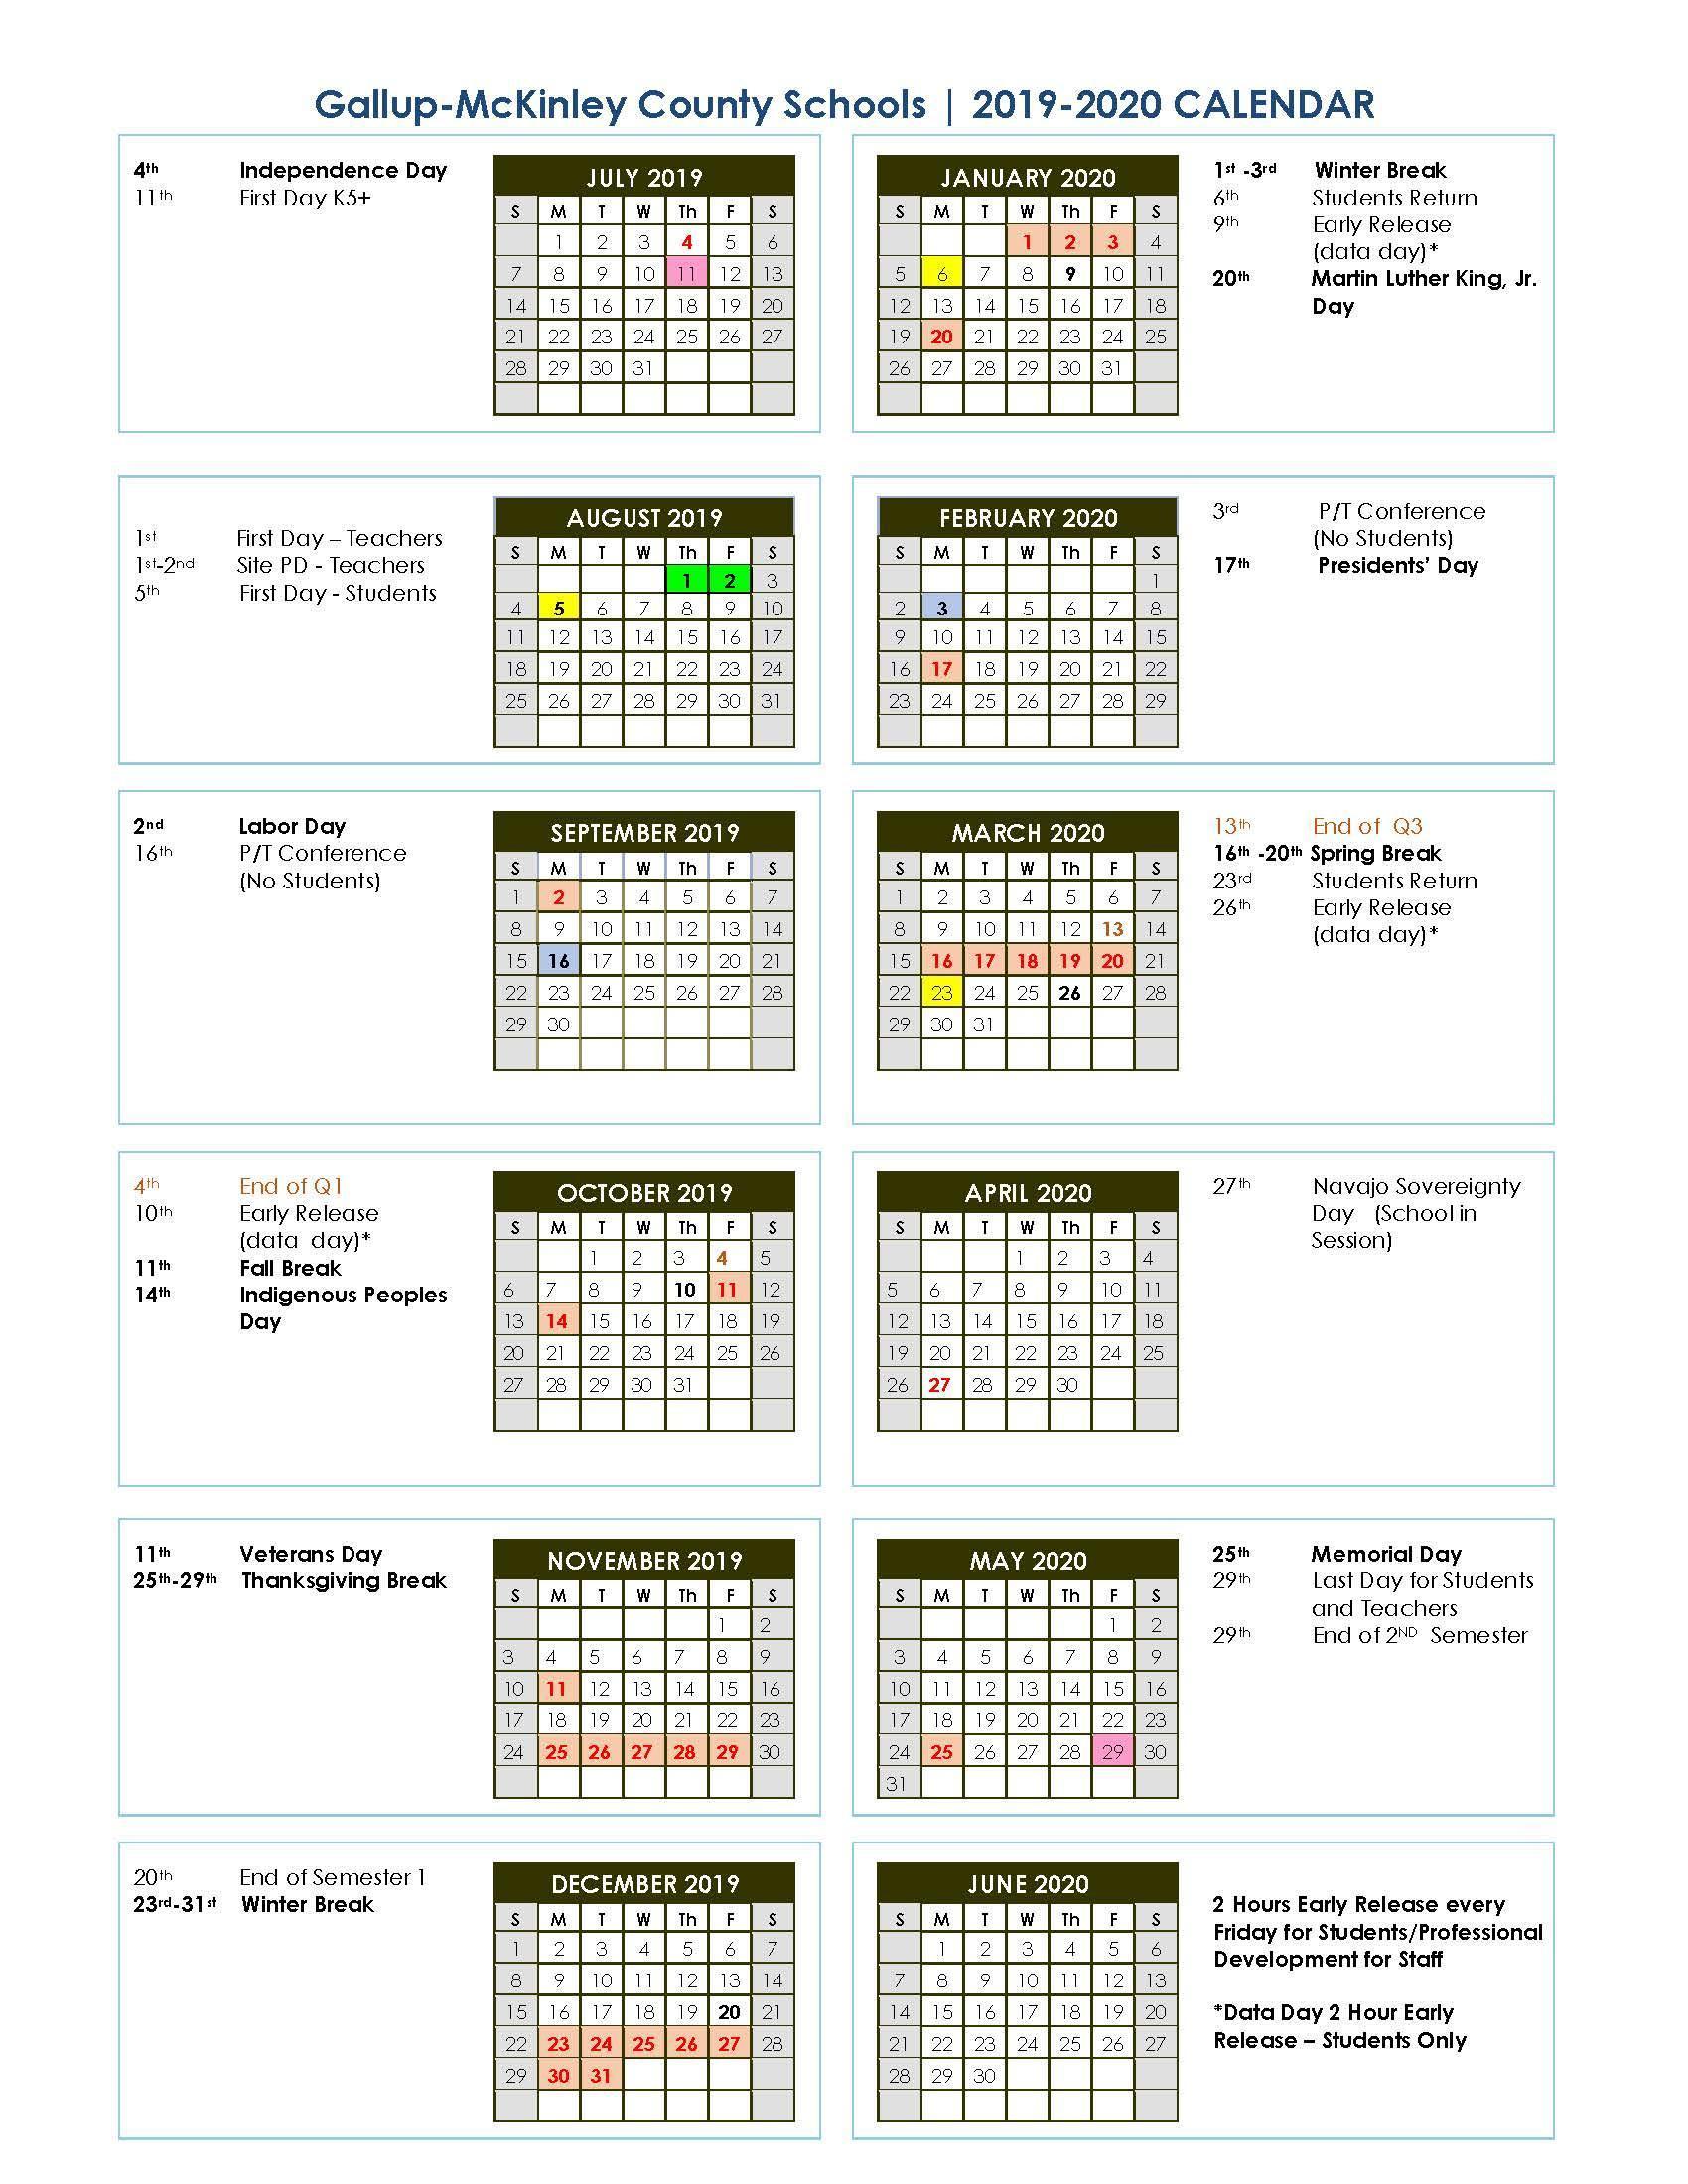 4 5 4 Retail Calendar 2021 2020 | Printable Calendar 2020-2021 throughout Retsil 4 5 4 Cakander